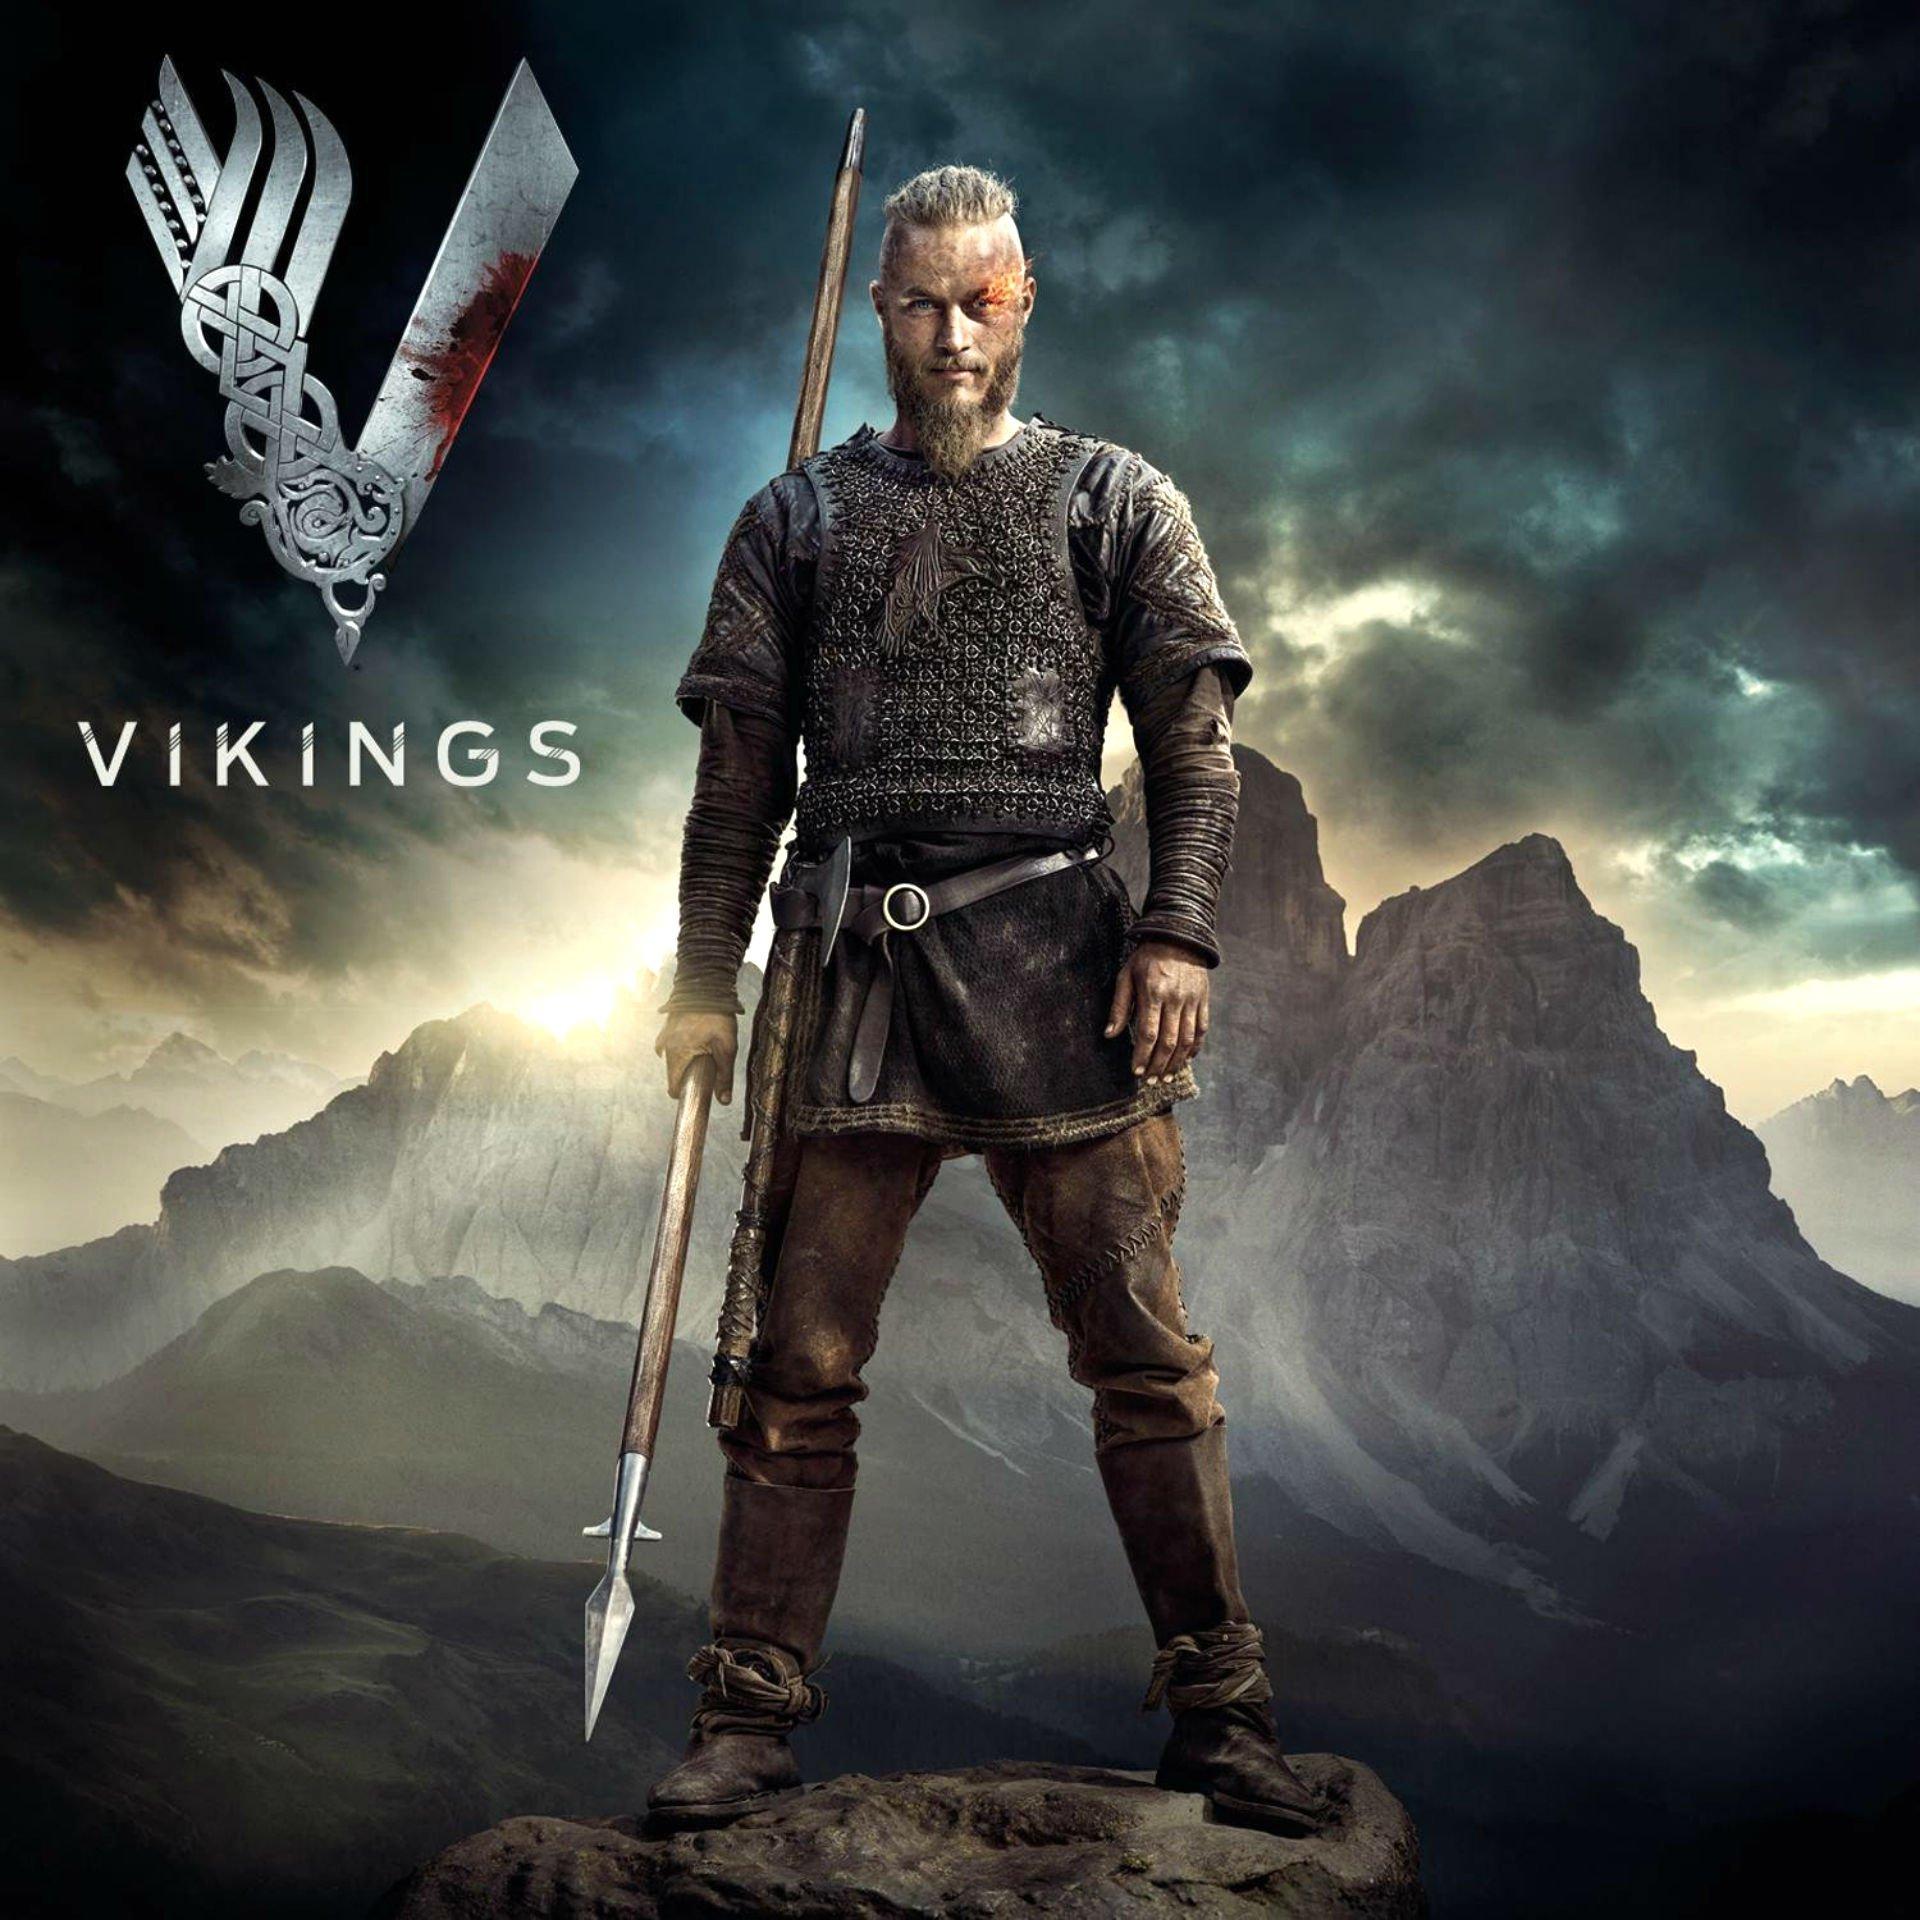 VIKINGS action drama history fantasy adventure series 1vikings viking 1920x1920